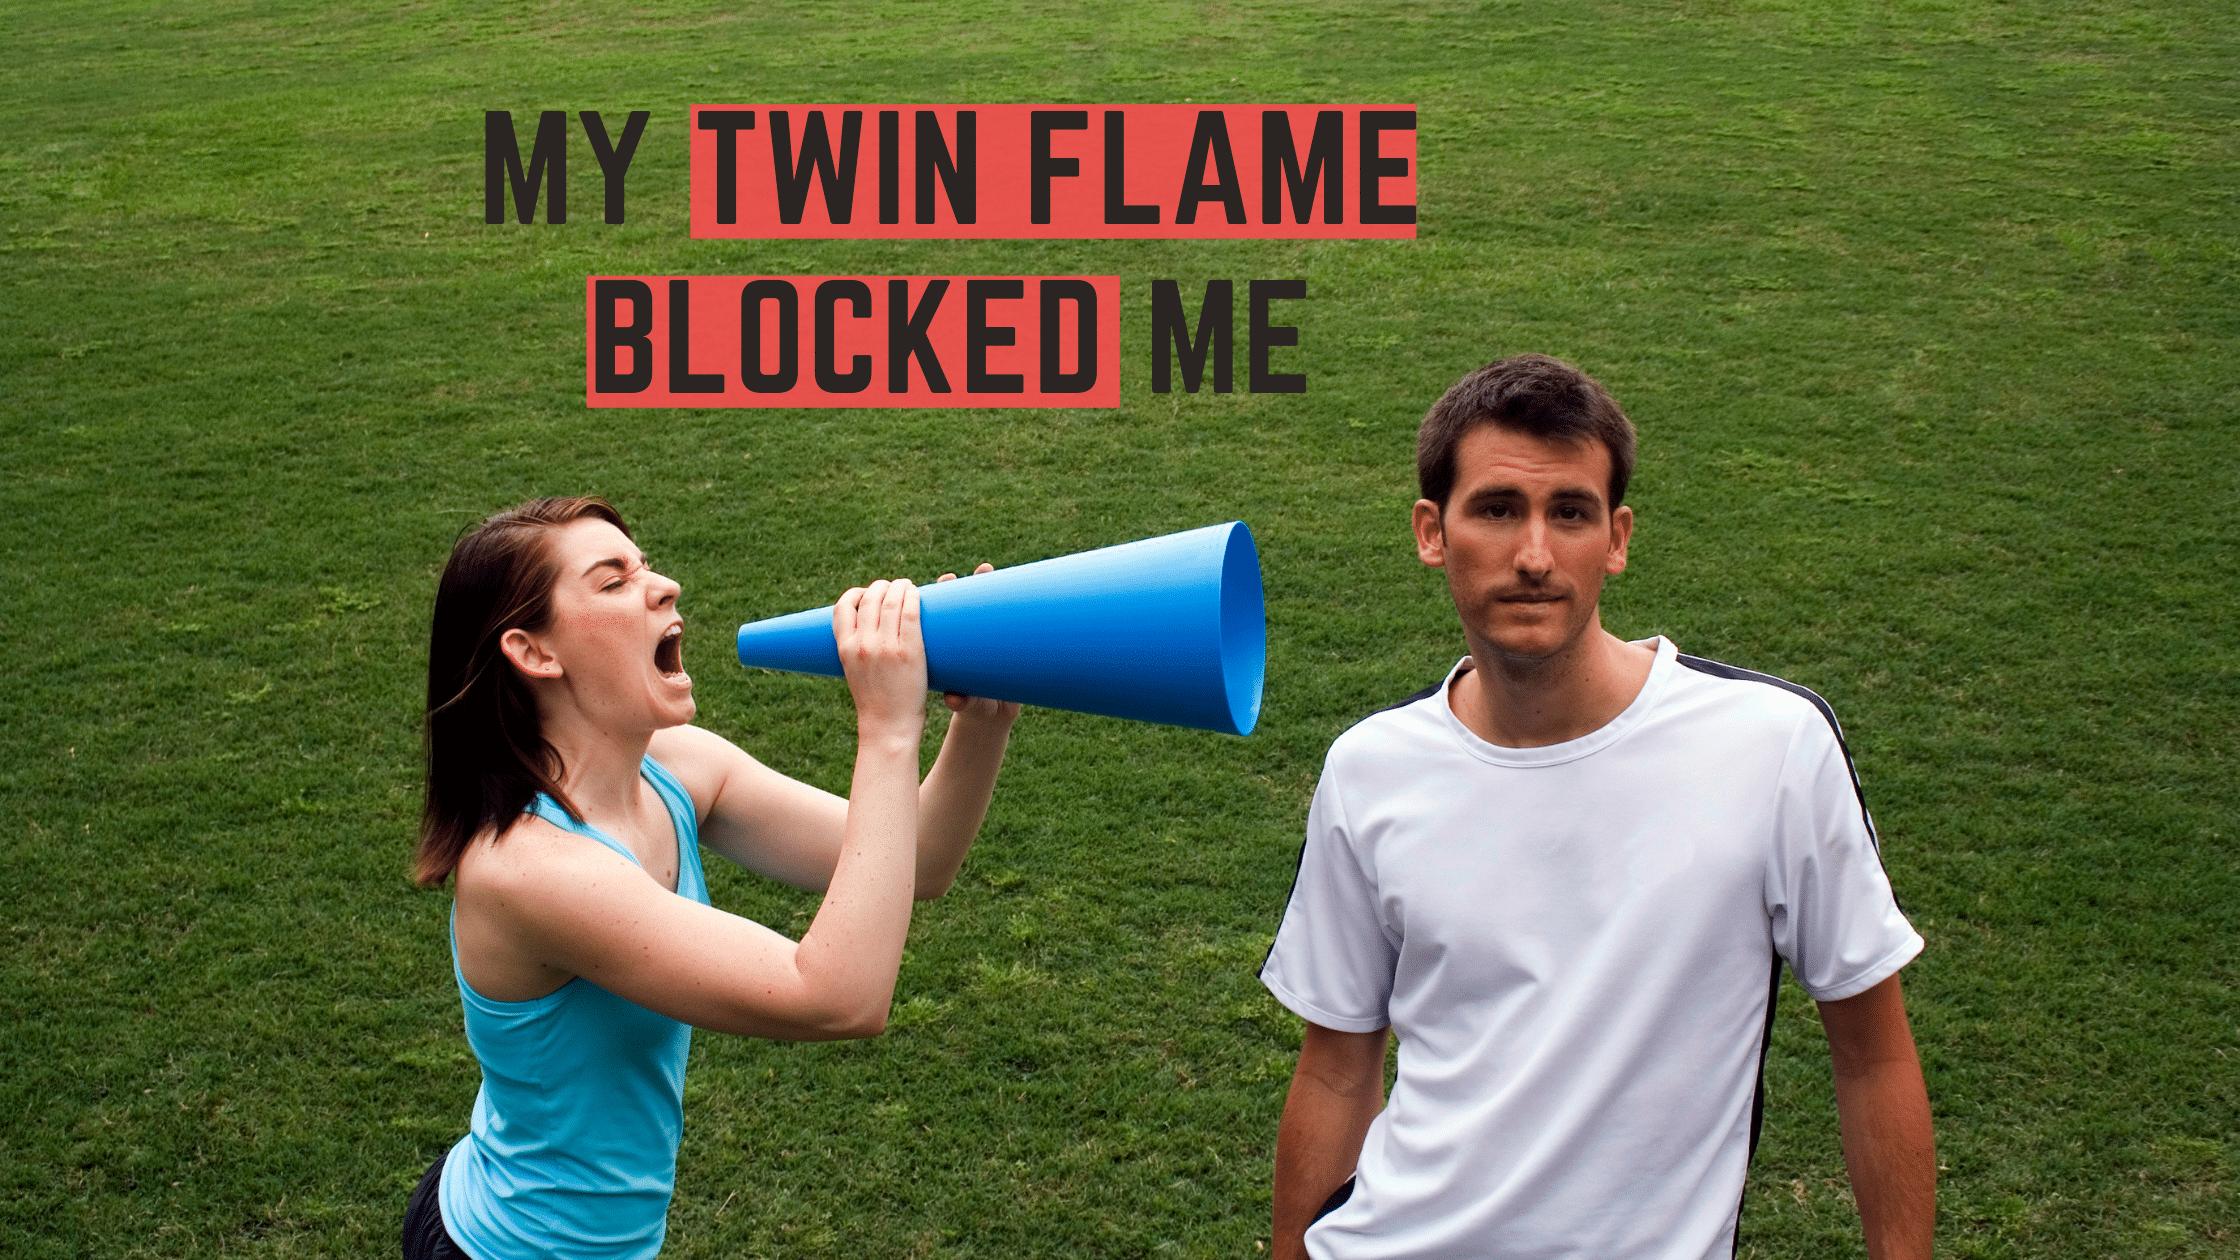 Twin Flame Blocked Me